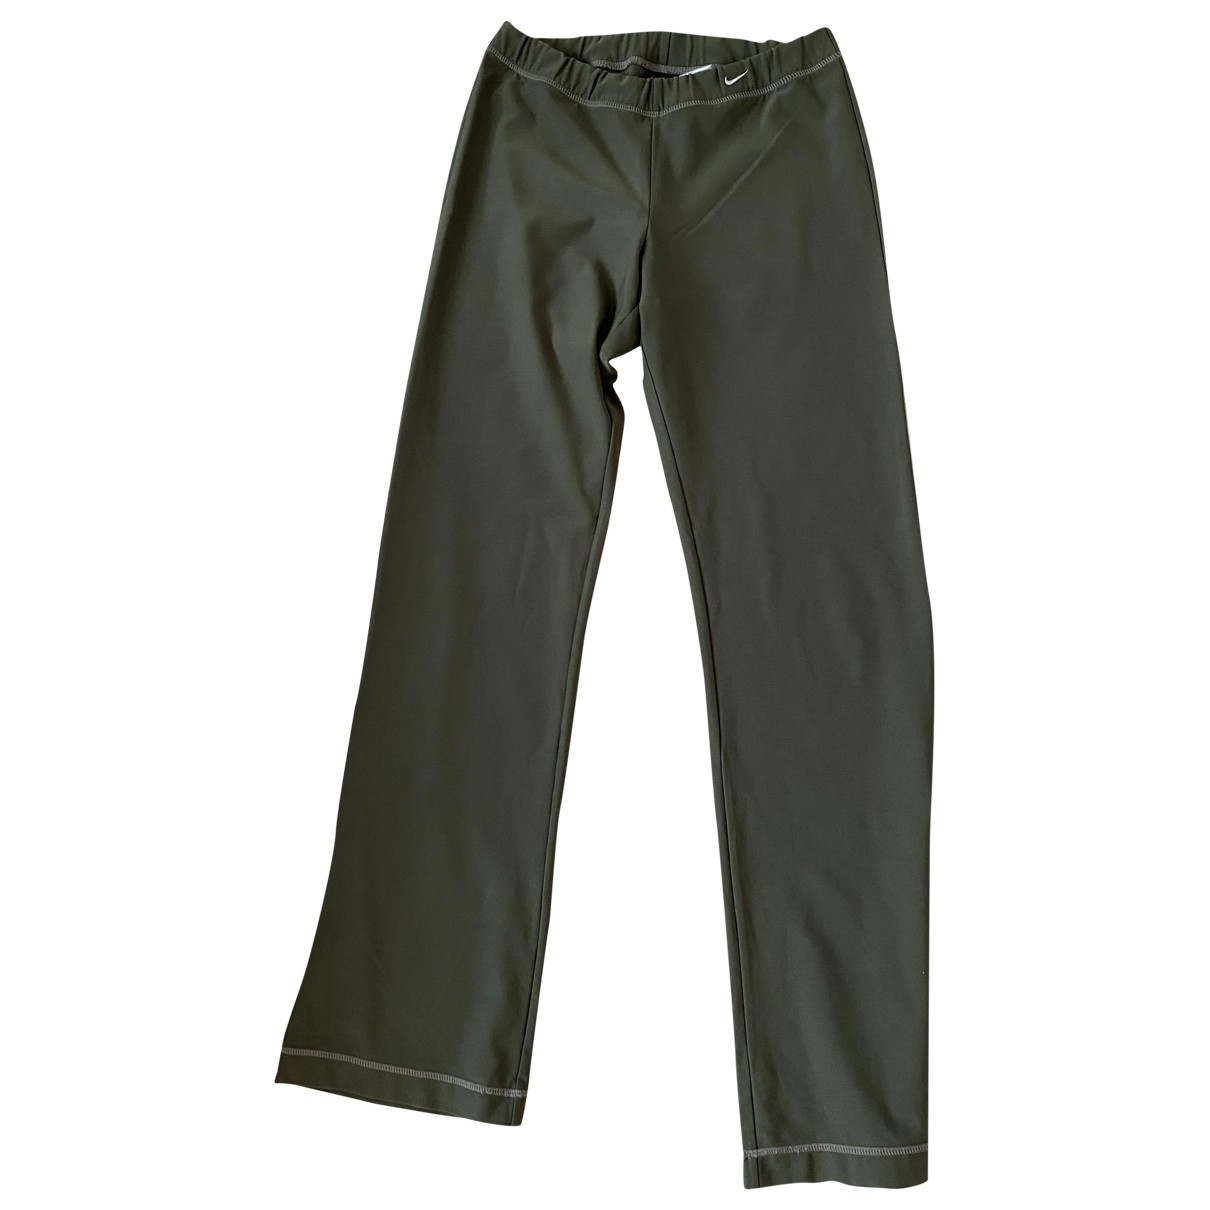 Nike \N Green Trousers for Women M International